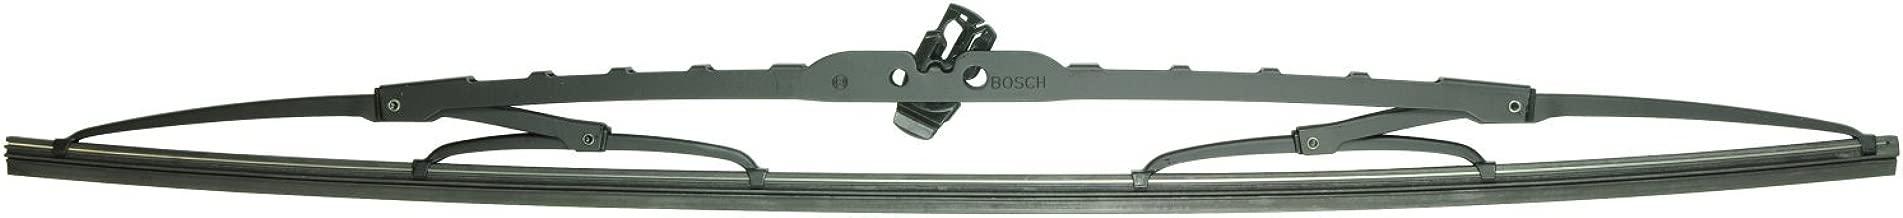 Bosch DirectConnect 40521 Wiper Blade - 21